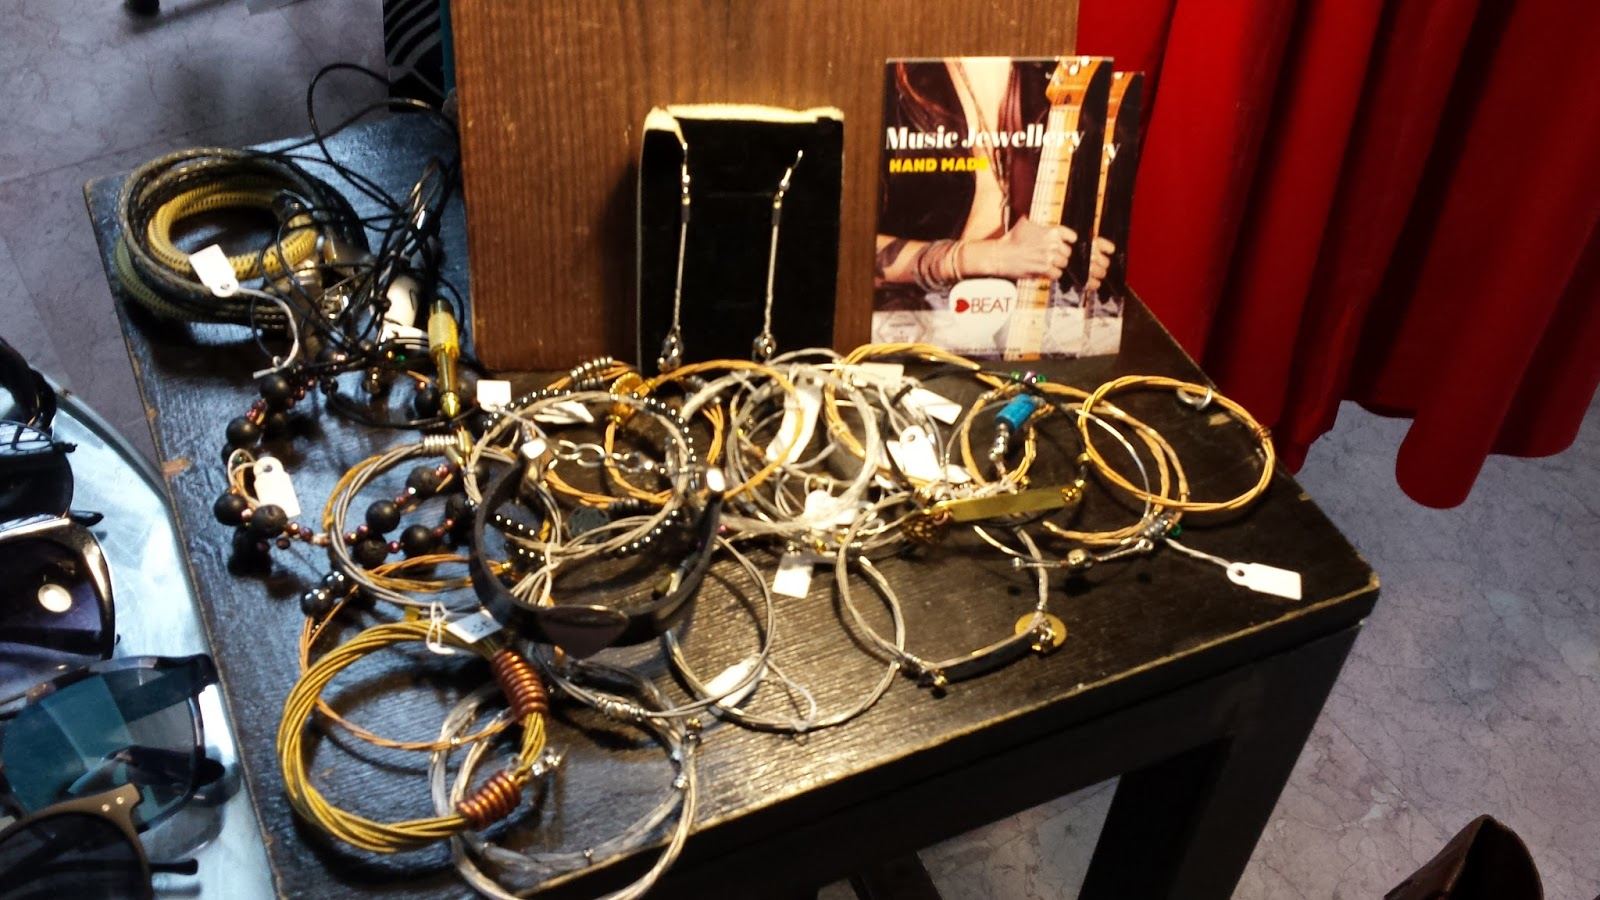 Heart Beat, Warsaw Vintage Market, Niebo, muzyczna biżuteria, polska biżuteria, biżuteria ze strun